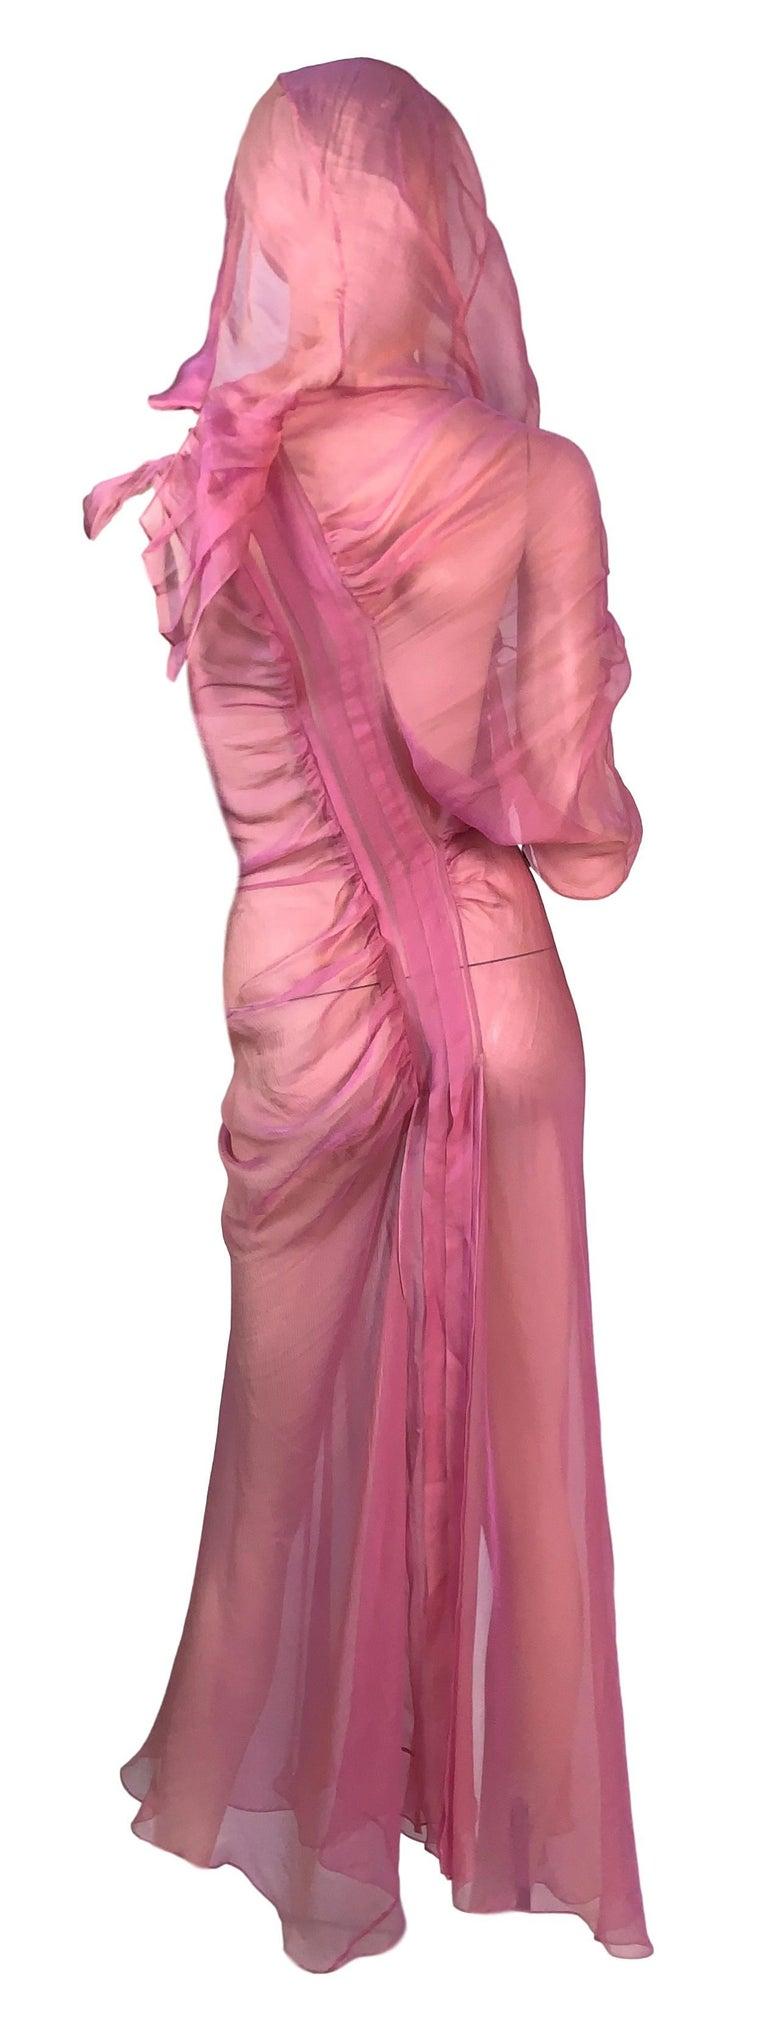 S/S 2002 Christian Dior John Galliano Runway Sheer Pink Hooded 2 Dresses 1